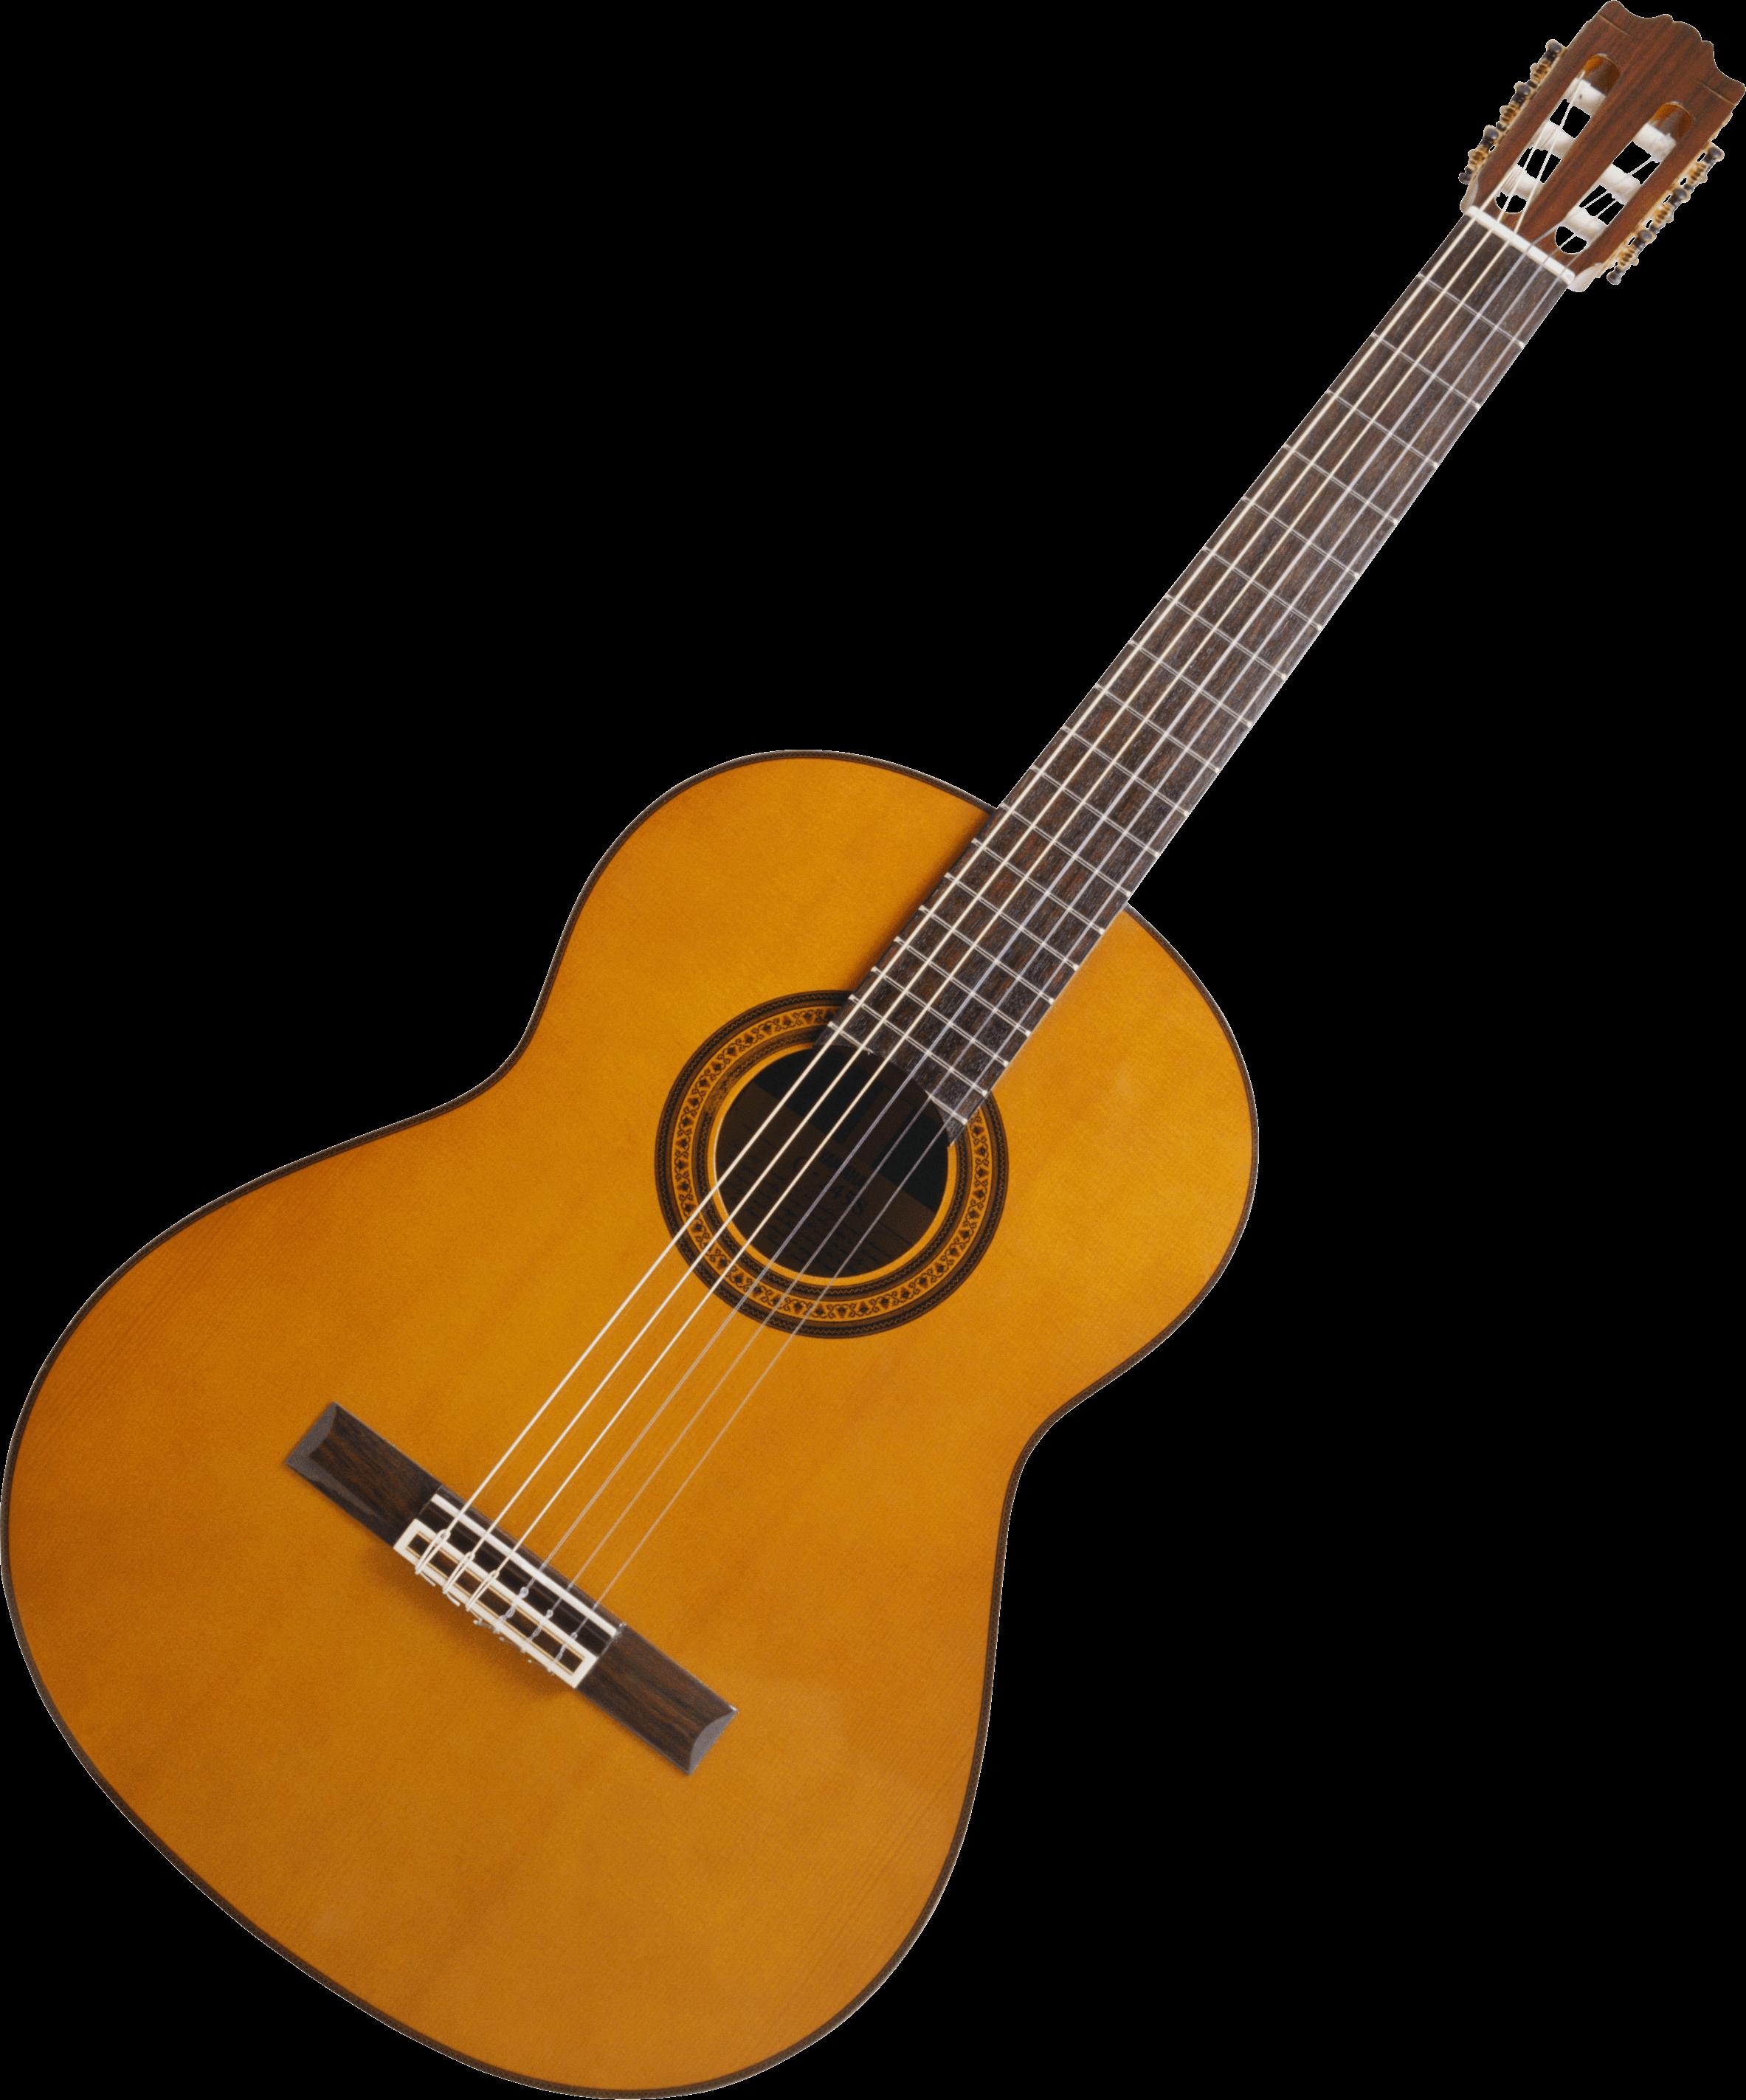 Free Cartoon Guitar Png, Download Free Clip Art, Free Clip Art on.